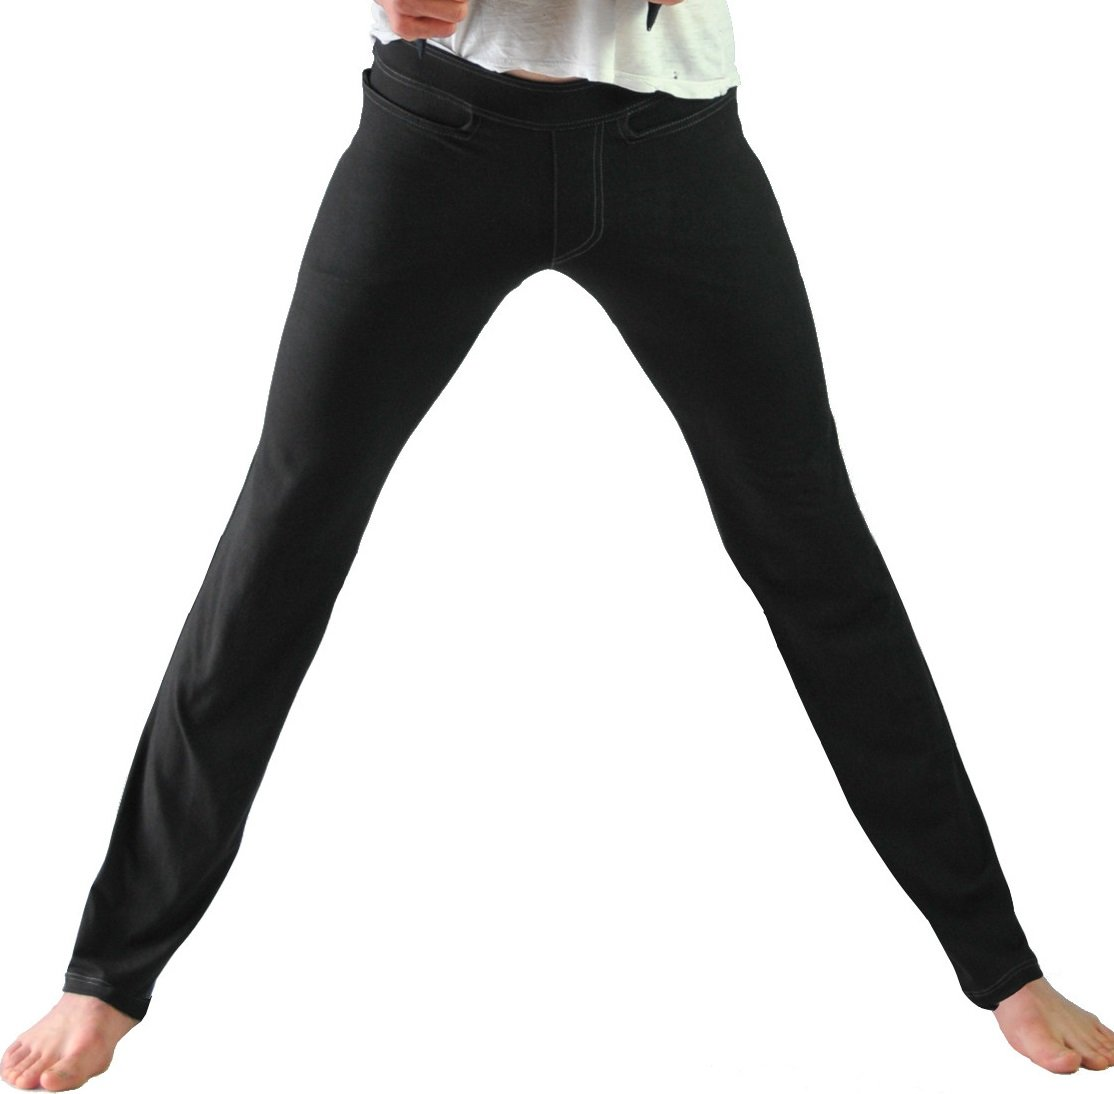 Bhujang Style Cobra Slim Mens Yoga Pants